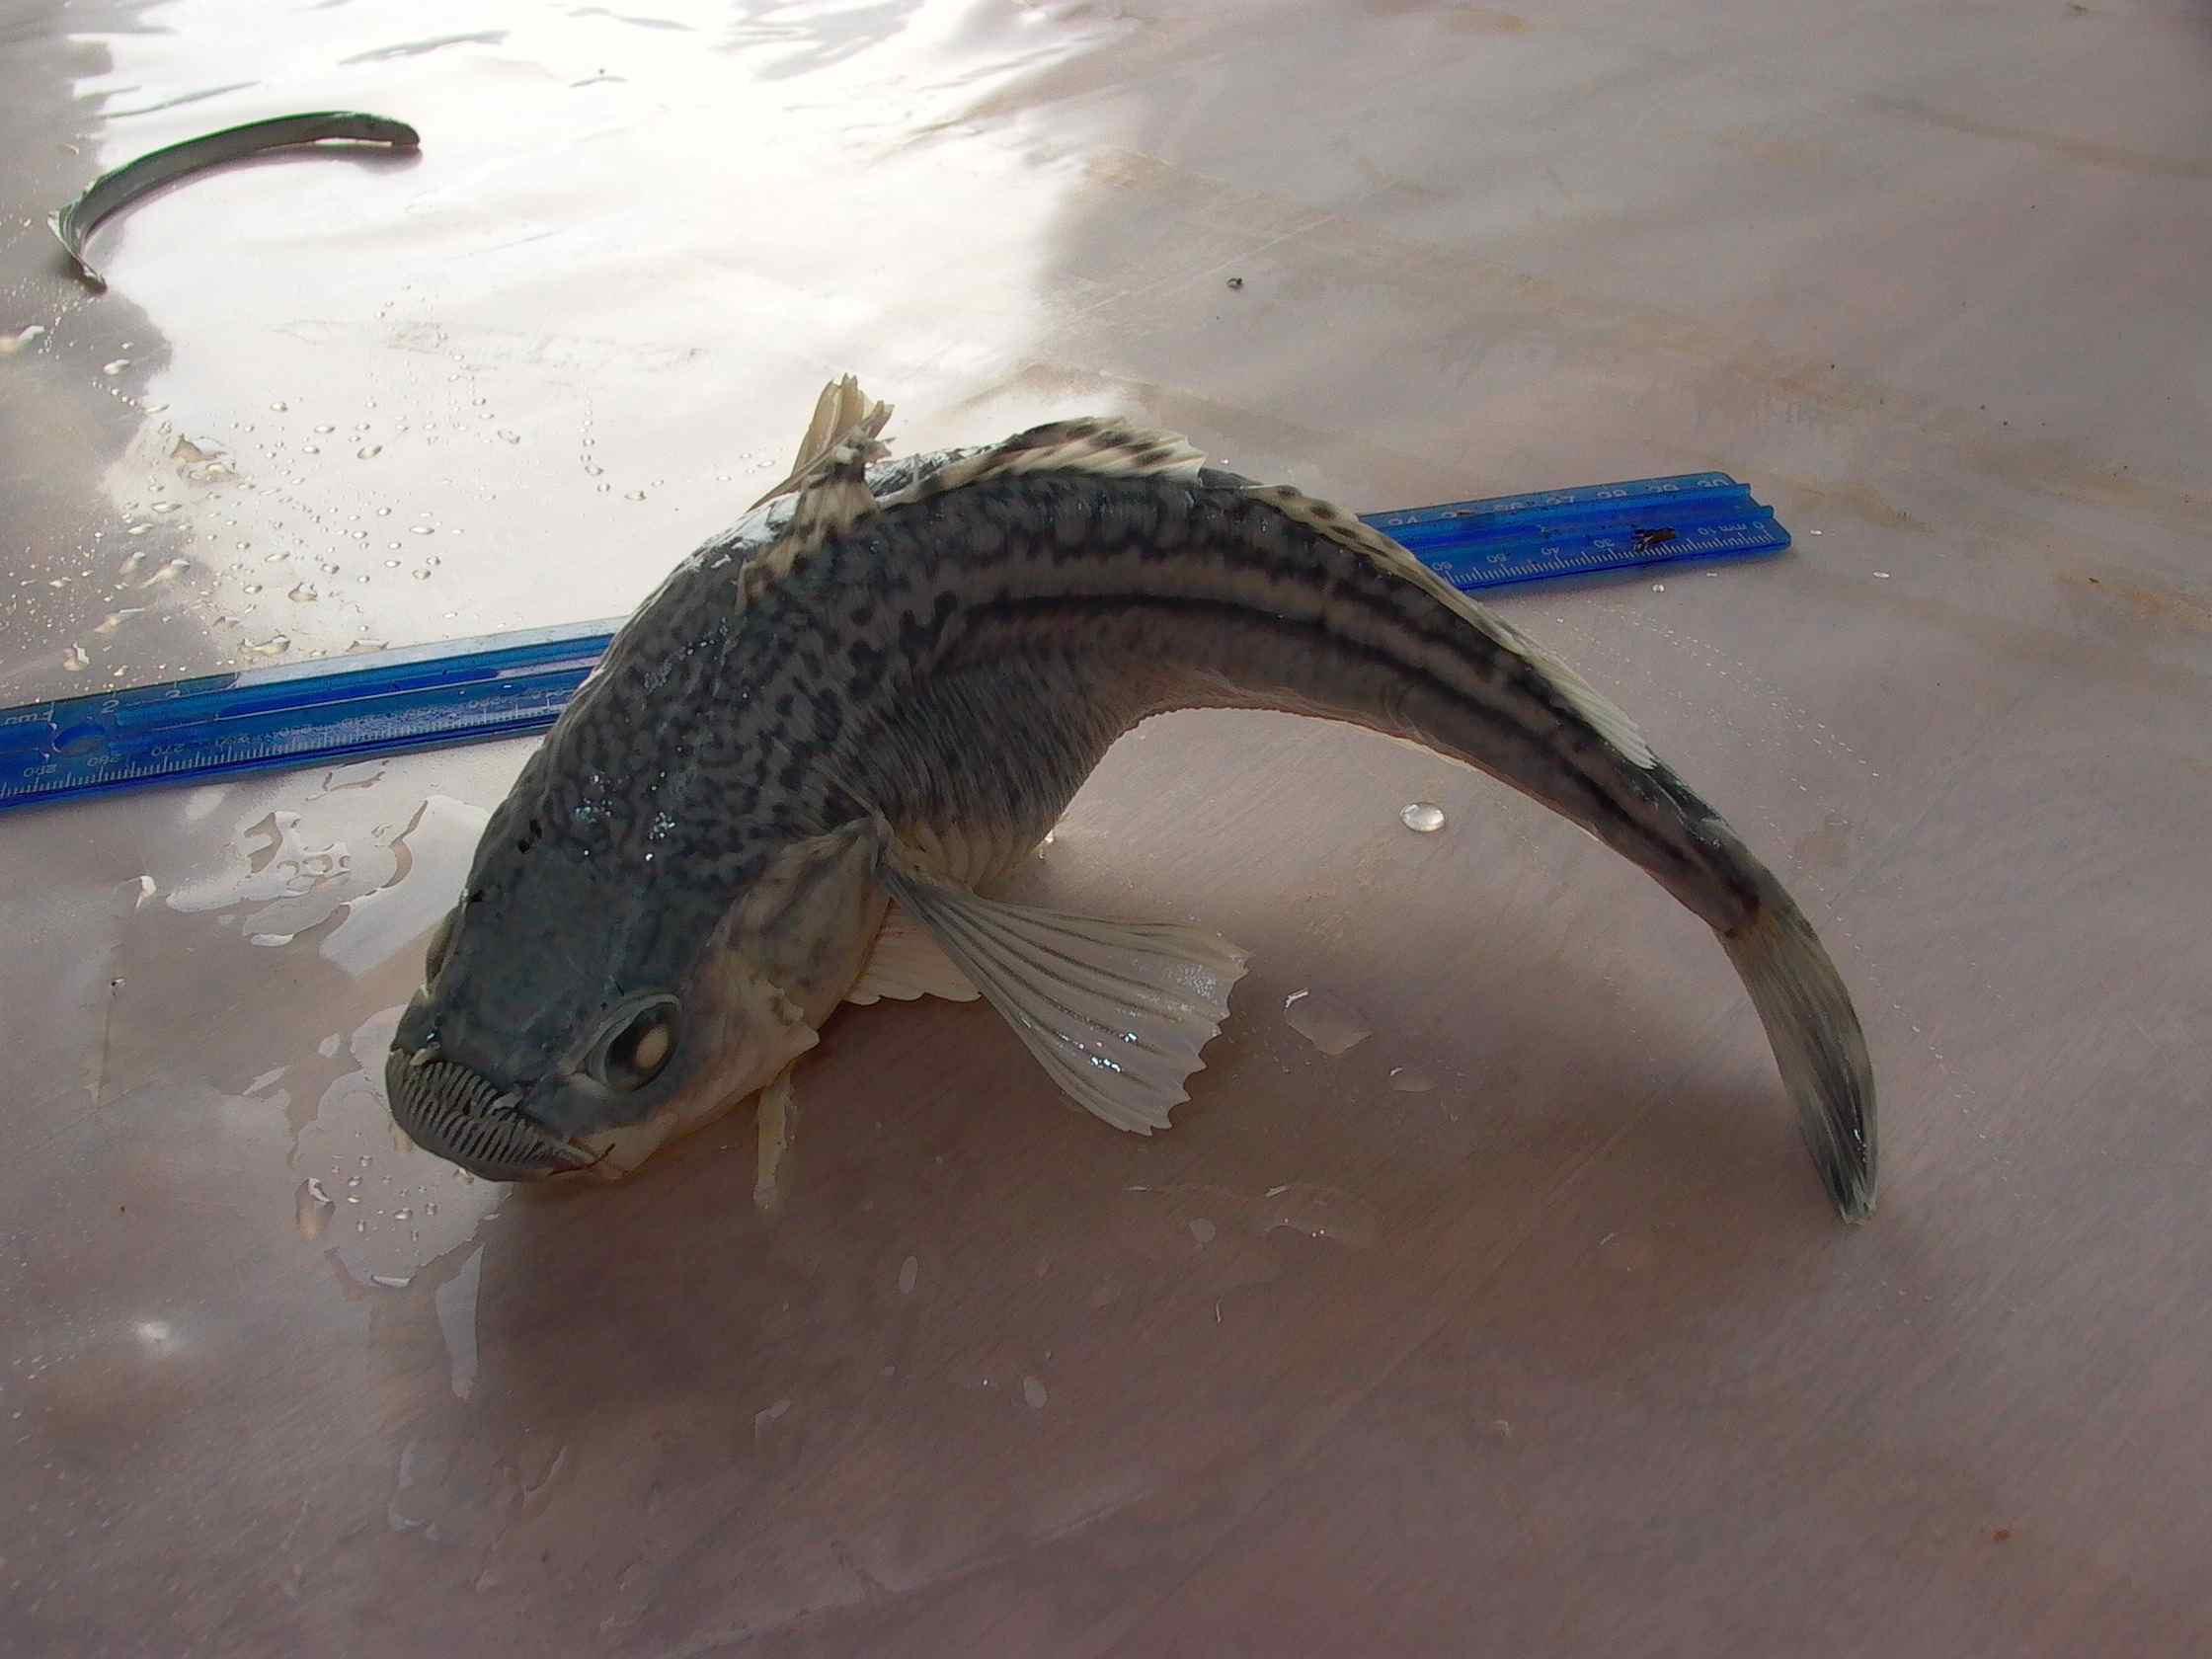 Cassiar Cannery - SERC - MB - JK - 2011/2012 - large sandfish 2